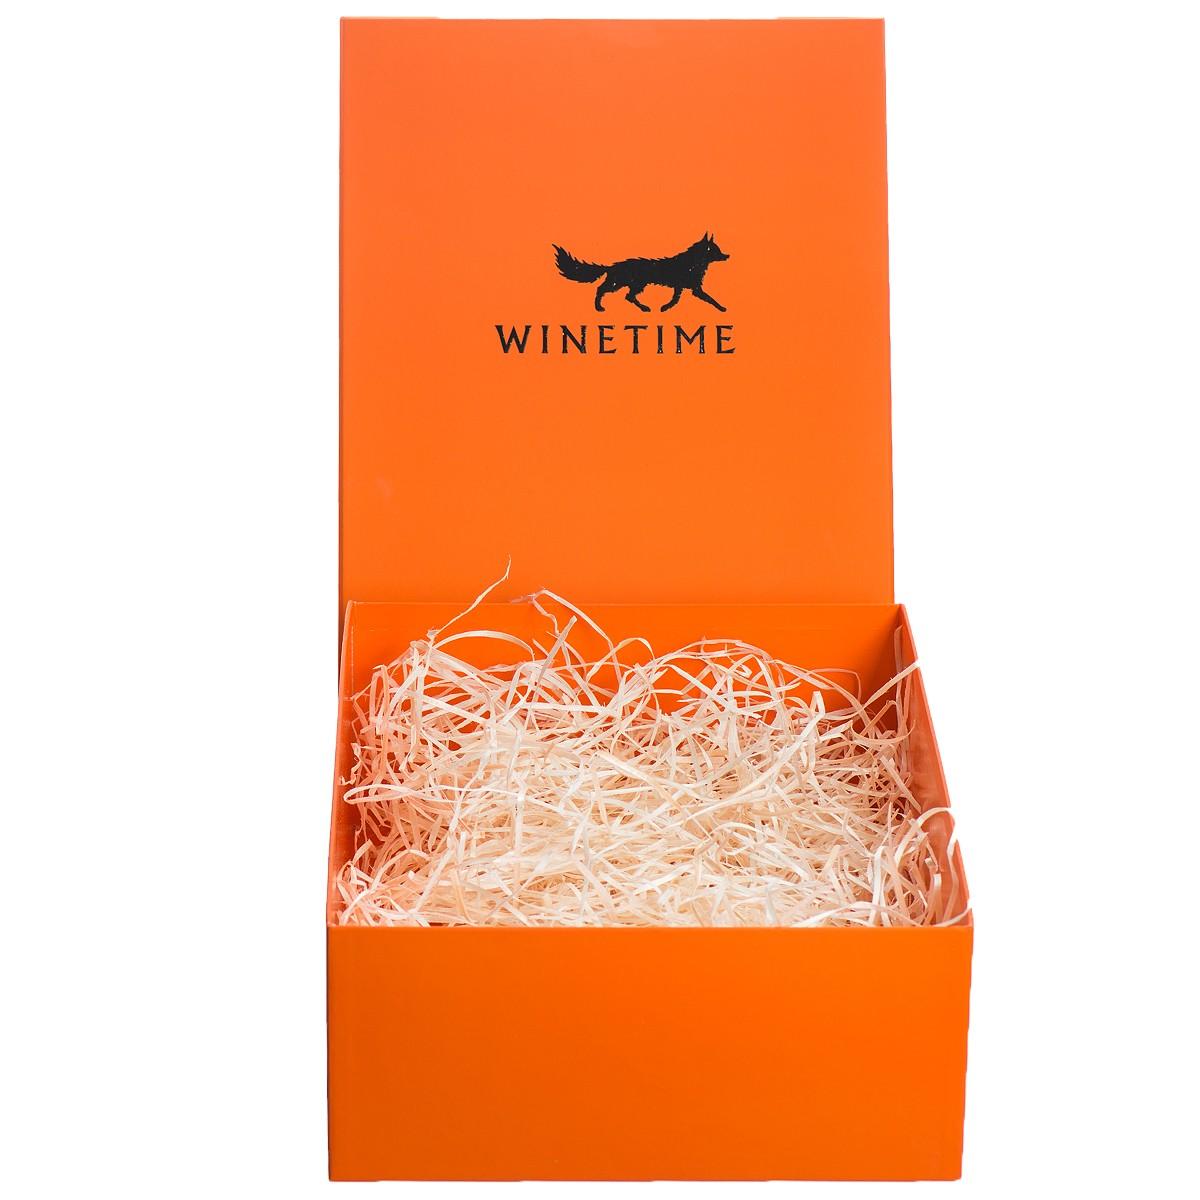 Короб подарочный WINETIME (оранжевый) фото